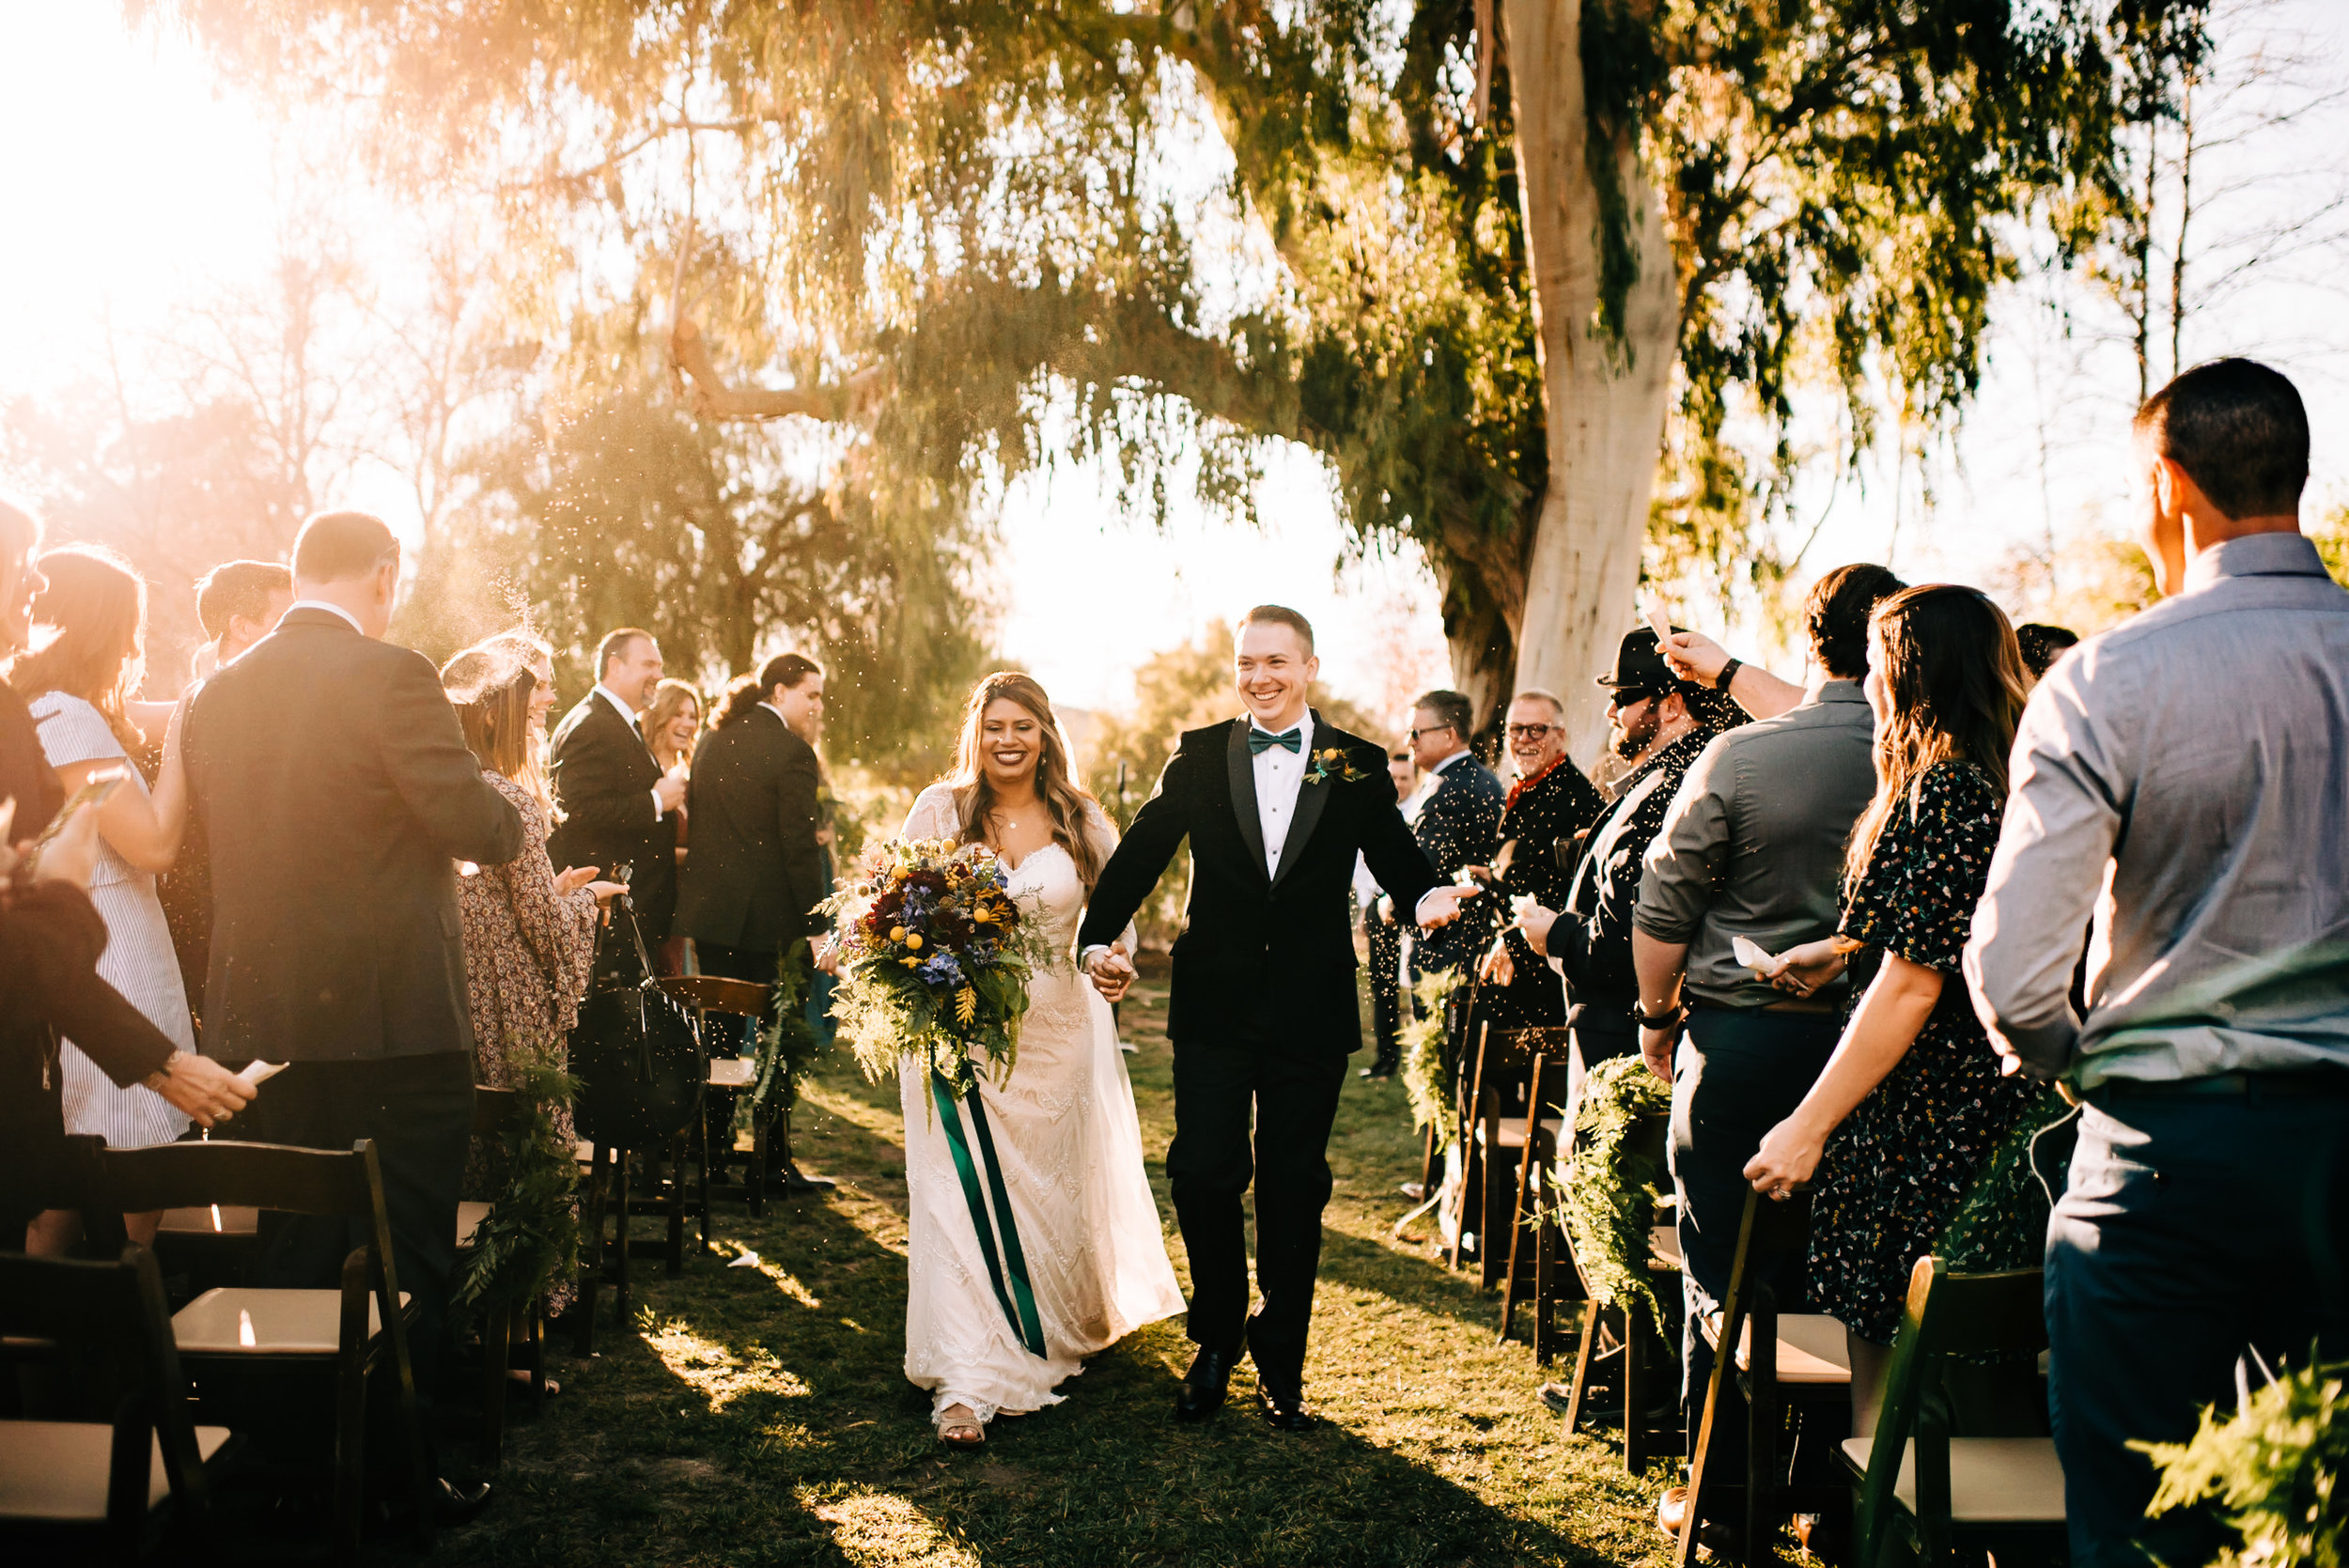 bay area nontraditional wedding photographer southern california boho wedding love light magic san francisco oakland northern california-629.jpg